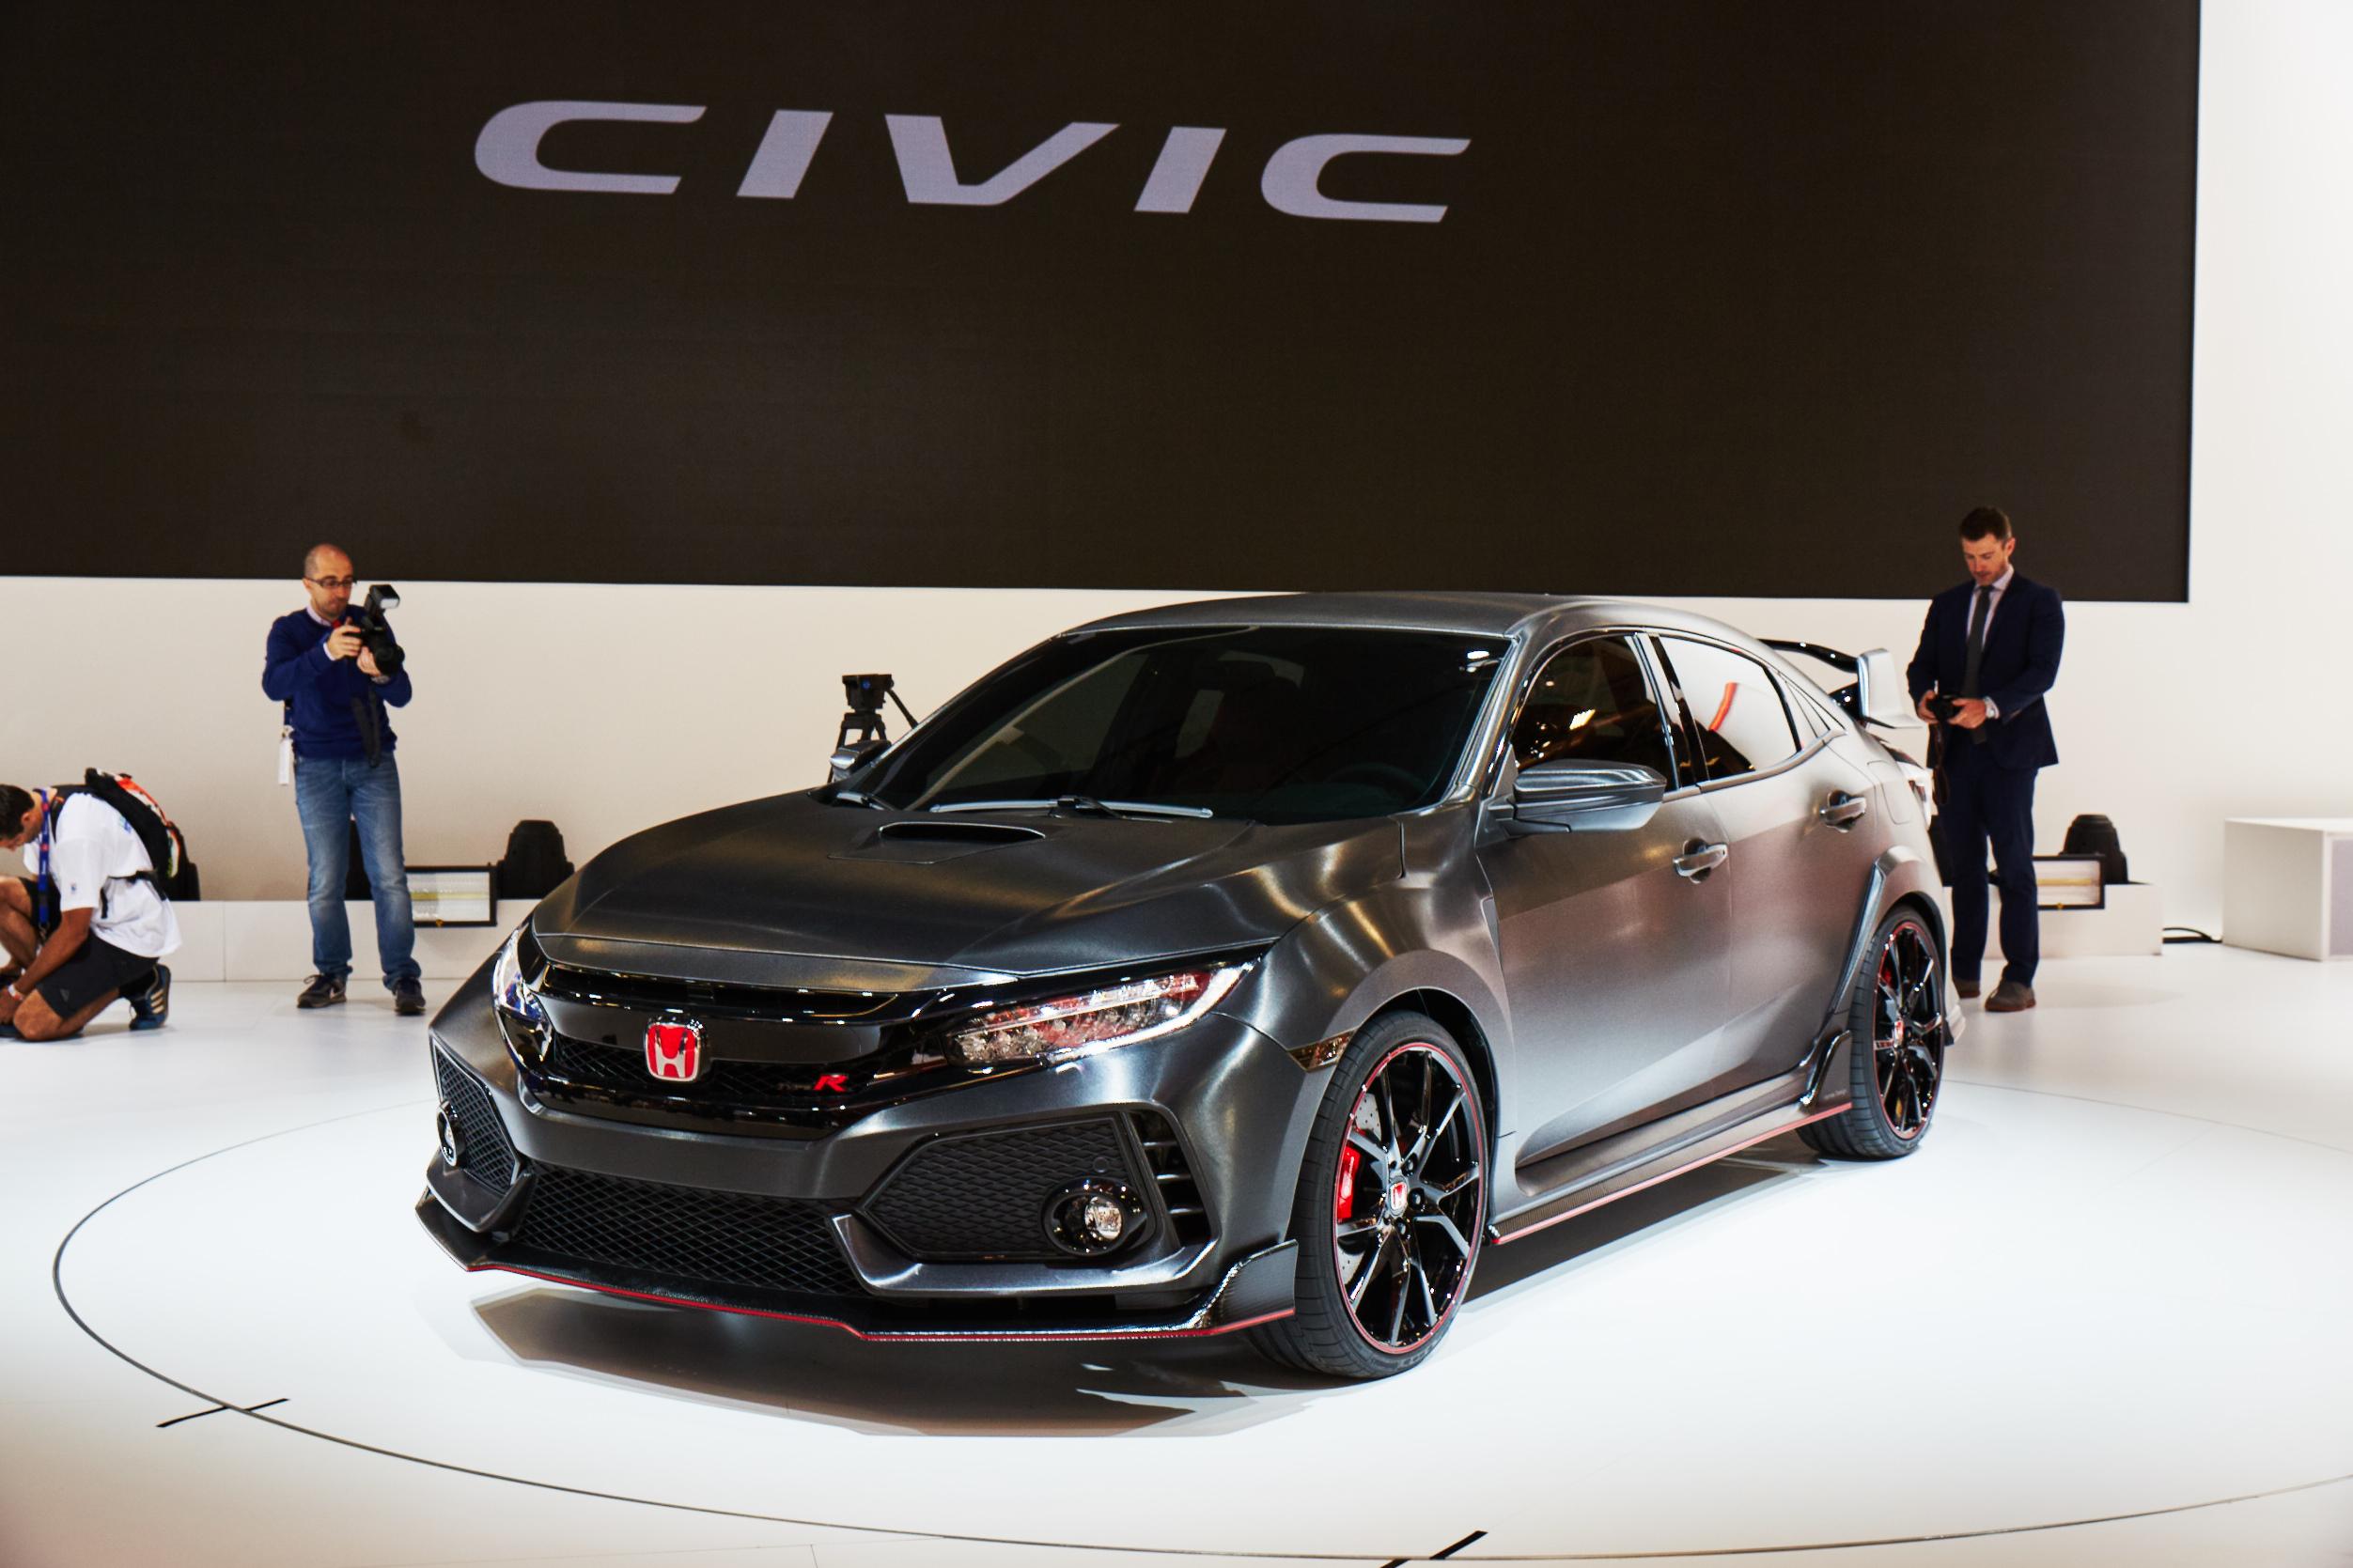 Paris Motor Show'da Honda'nın Sürprizi: Civic Type R Prototipi